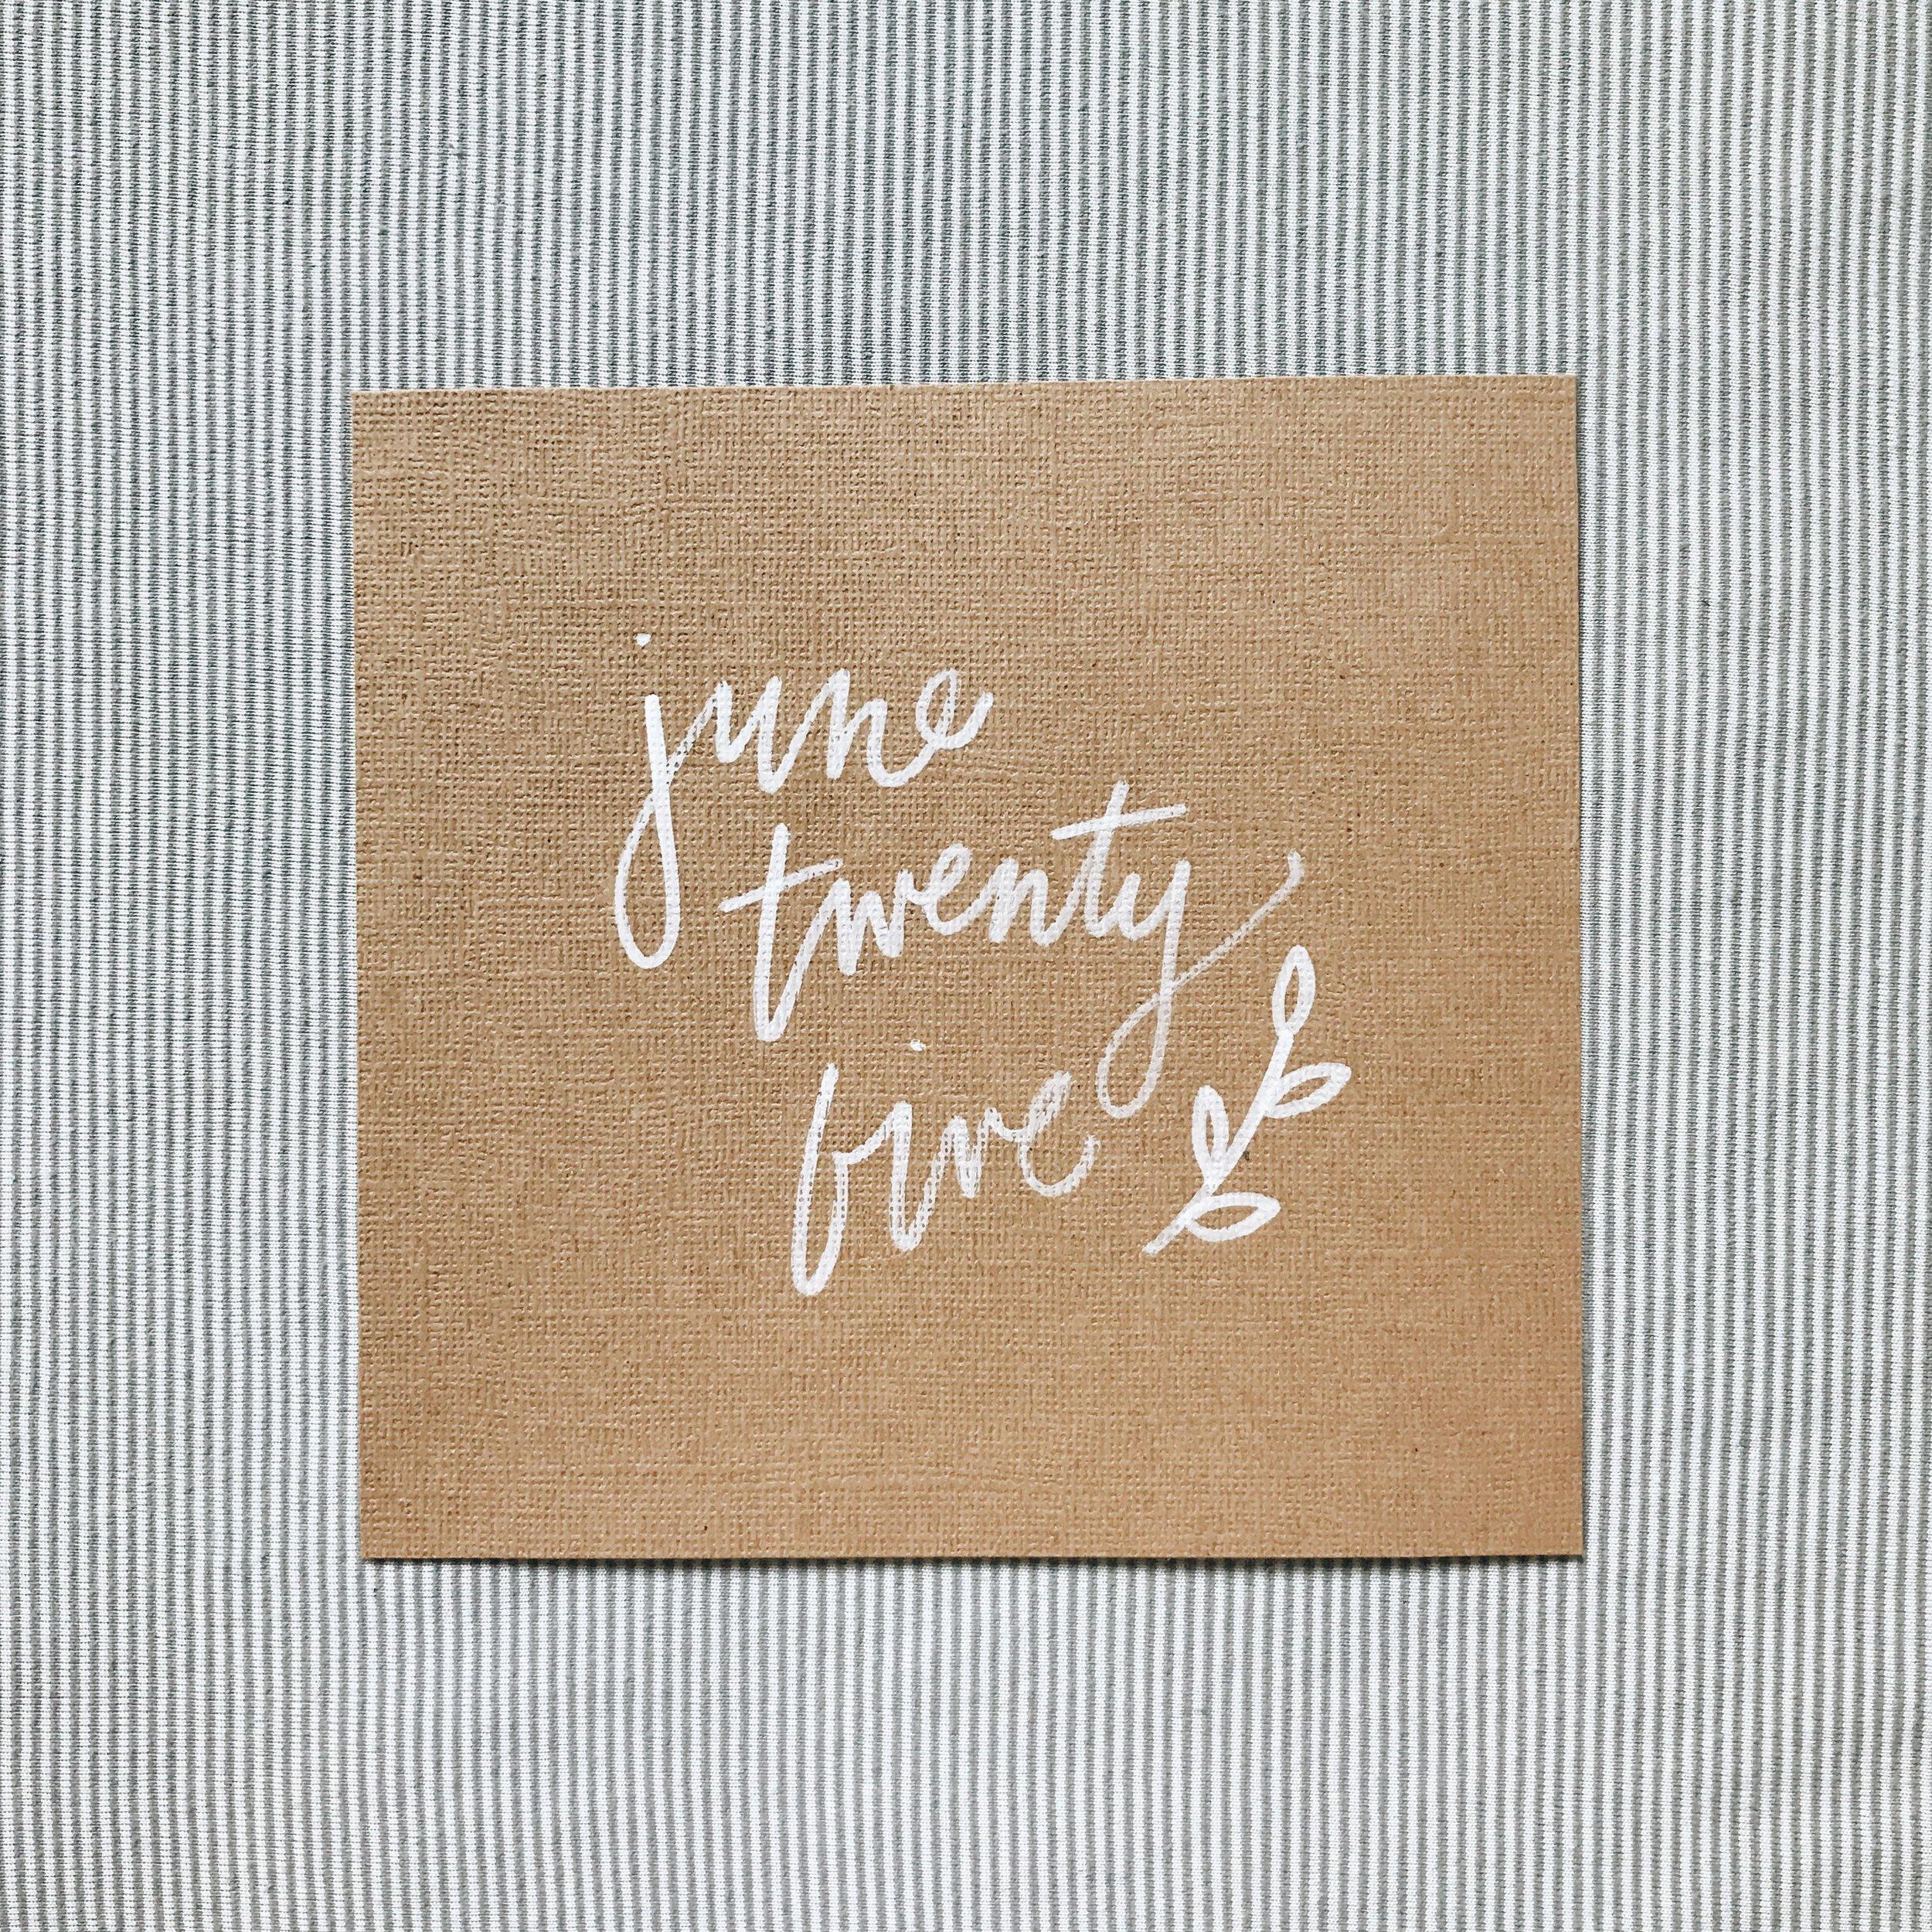 jun25.JPG